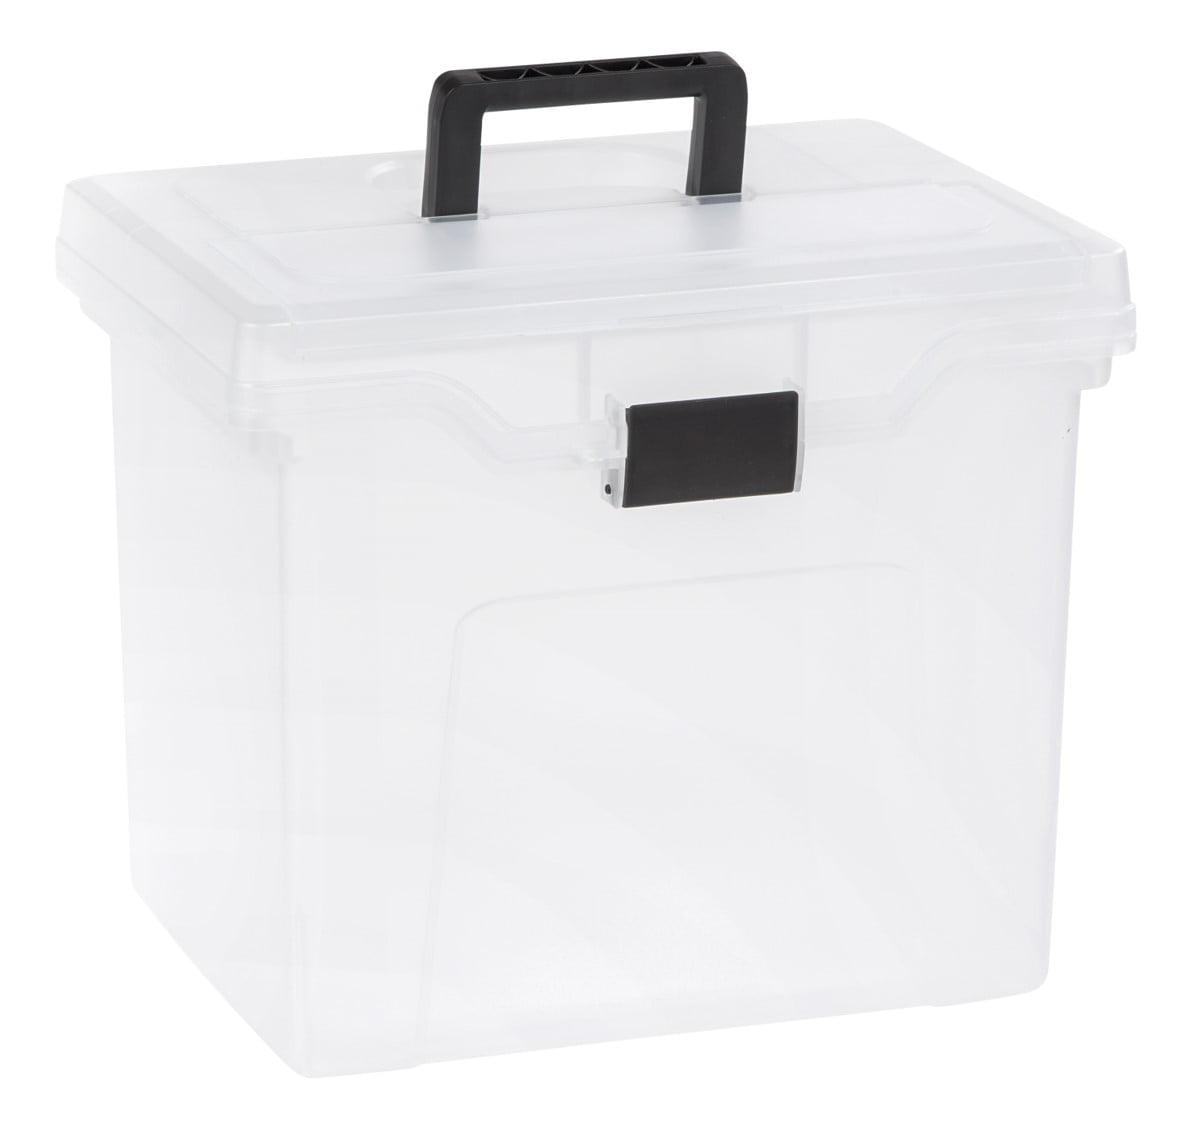 Bankers Box LIBERTY Storage Box Record Form 9 1//2 x 23 1//4 x 6 White//Blue 12